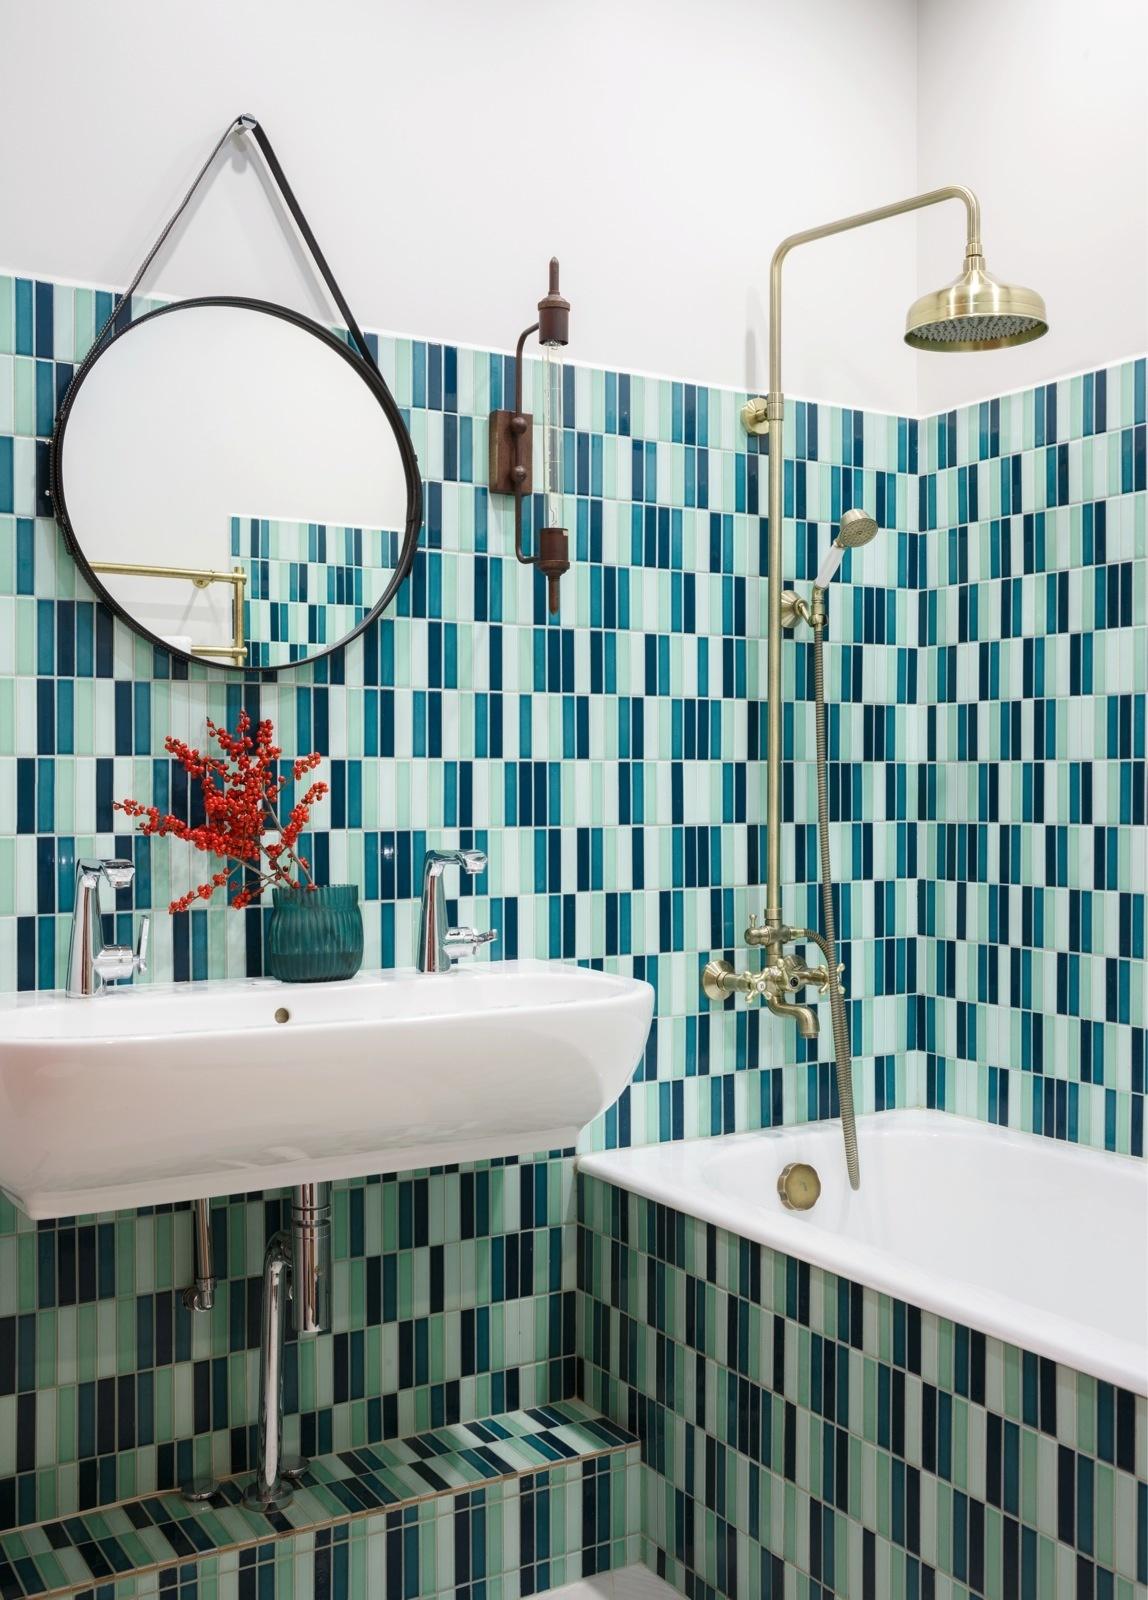 плитка в ванной (галерея 0, фото 1)